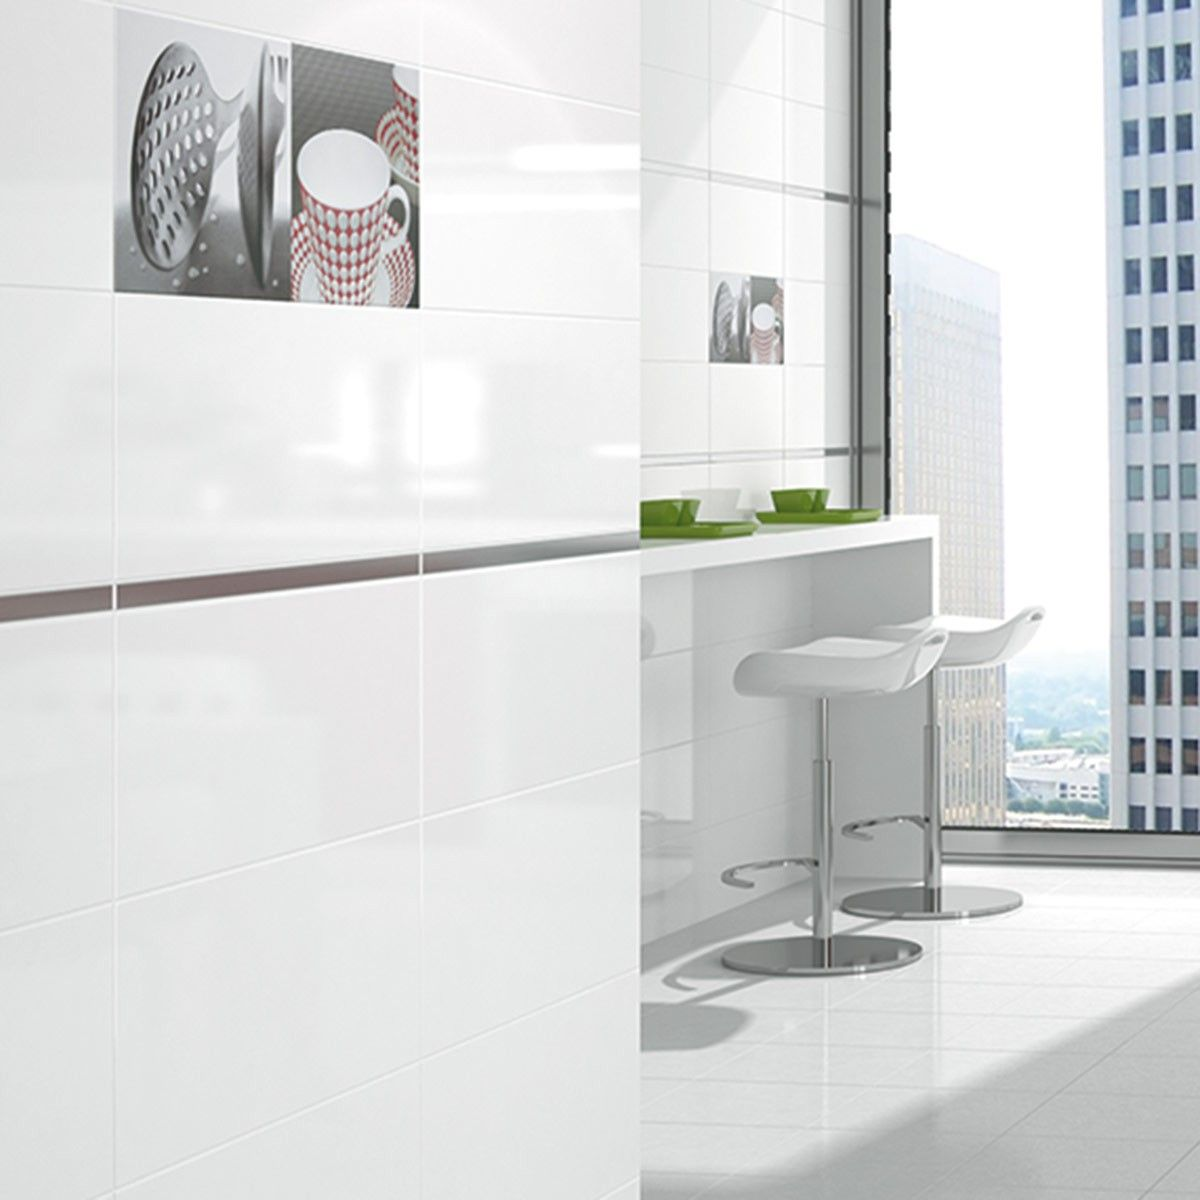 alaska blanco white gloss tile black and white bathroom ideas alaska blanco white gloss tile black and white bathroom ideas white tiles